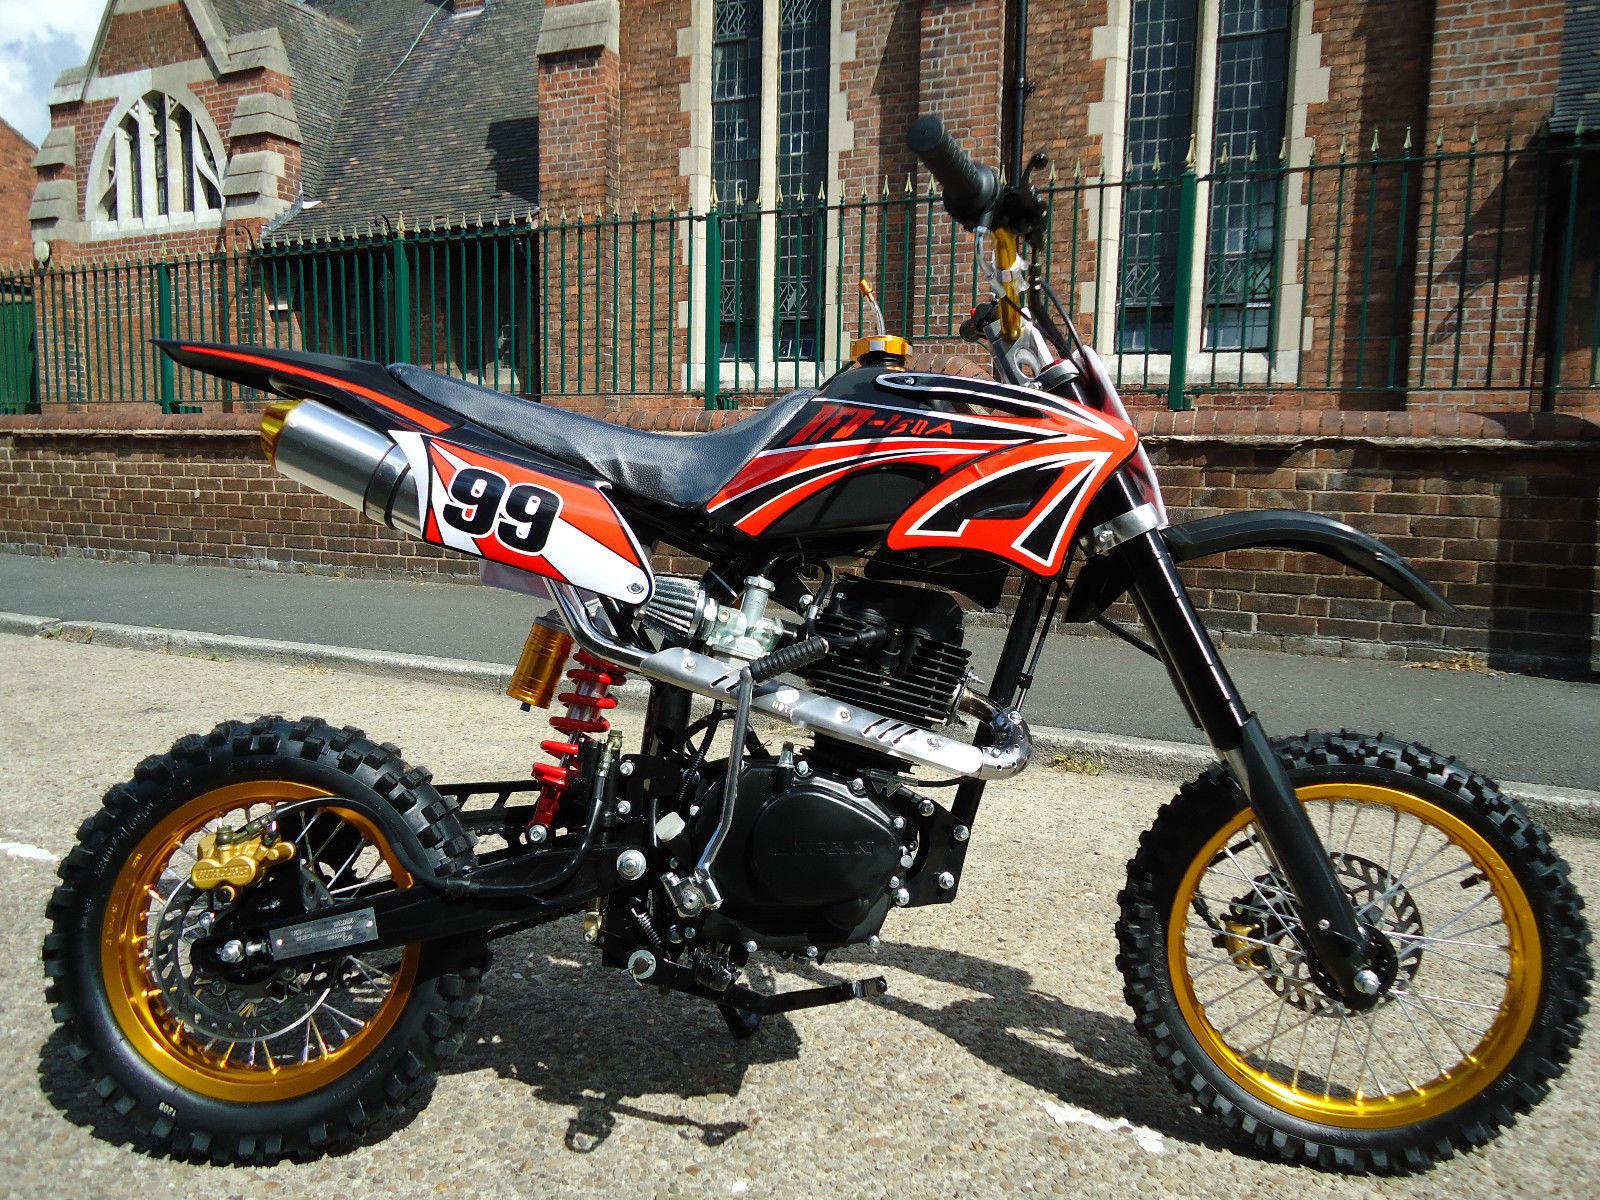 new dmx 150cc pit bikes dirt bikes pit bike 125cc. Black Bedroom Furniture Sets. Home Design Ideas